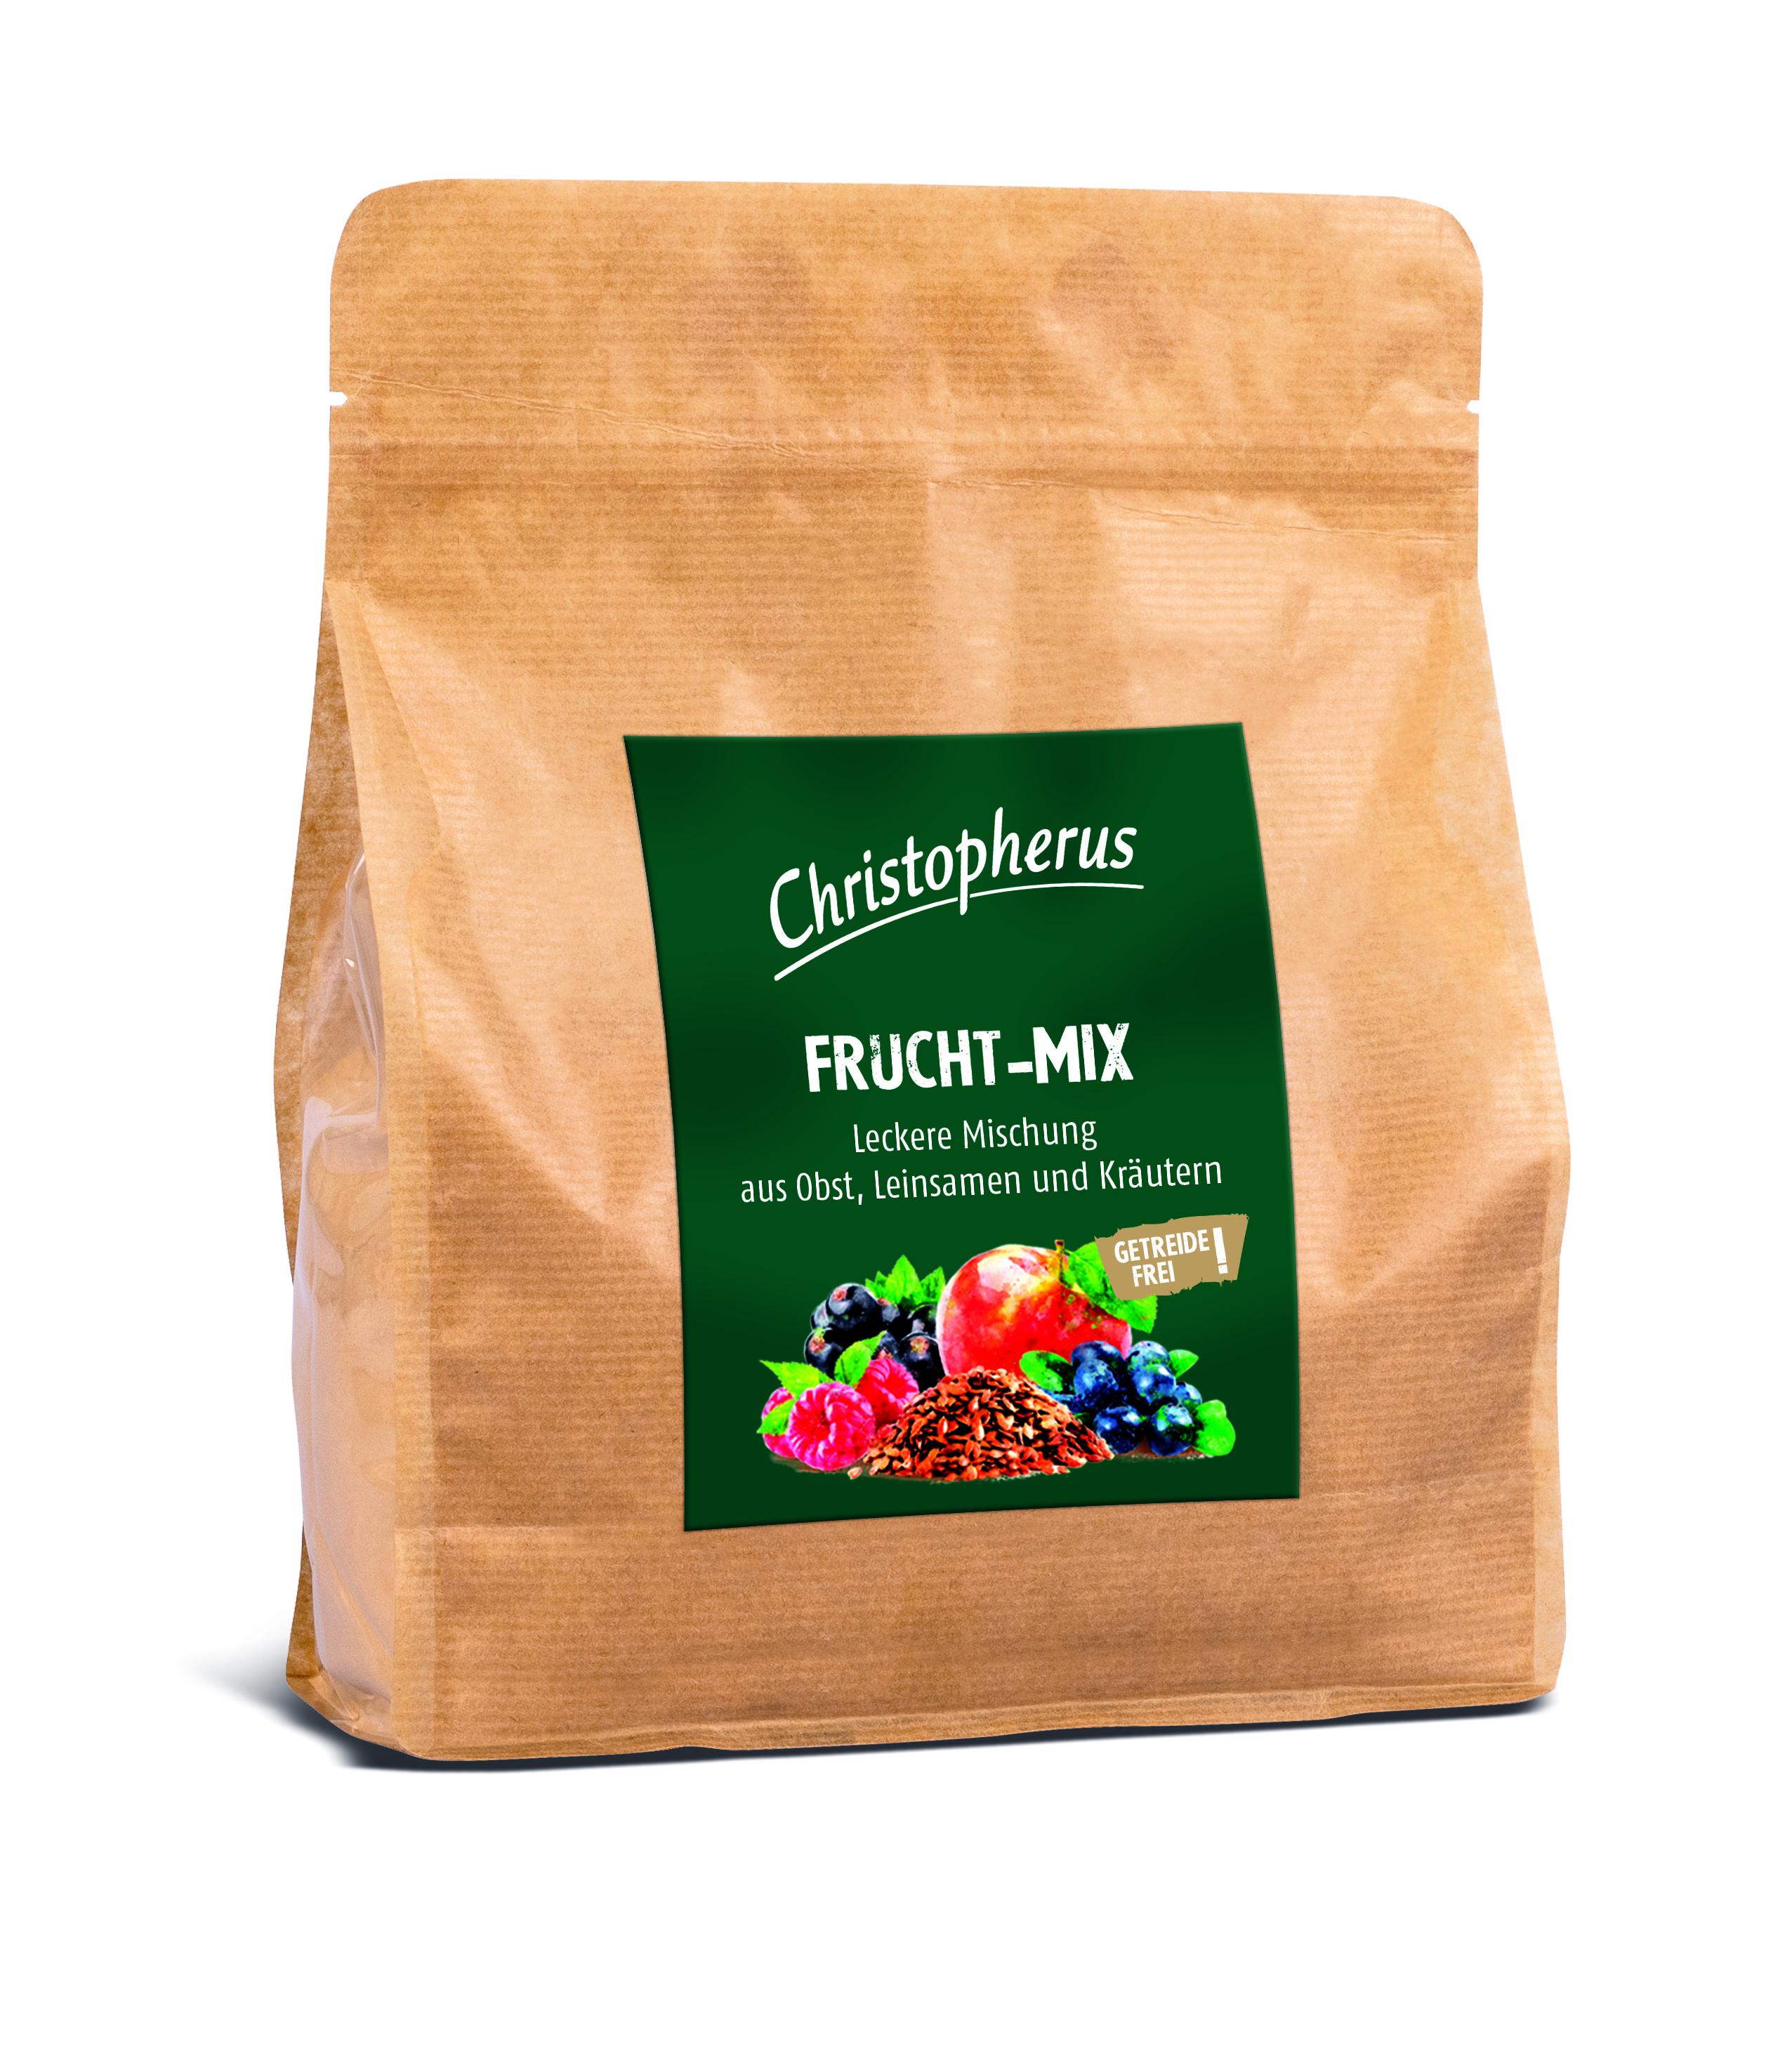 Christopherus – Frucht Mix